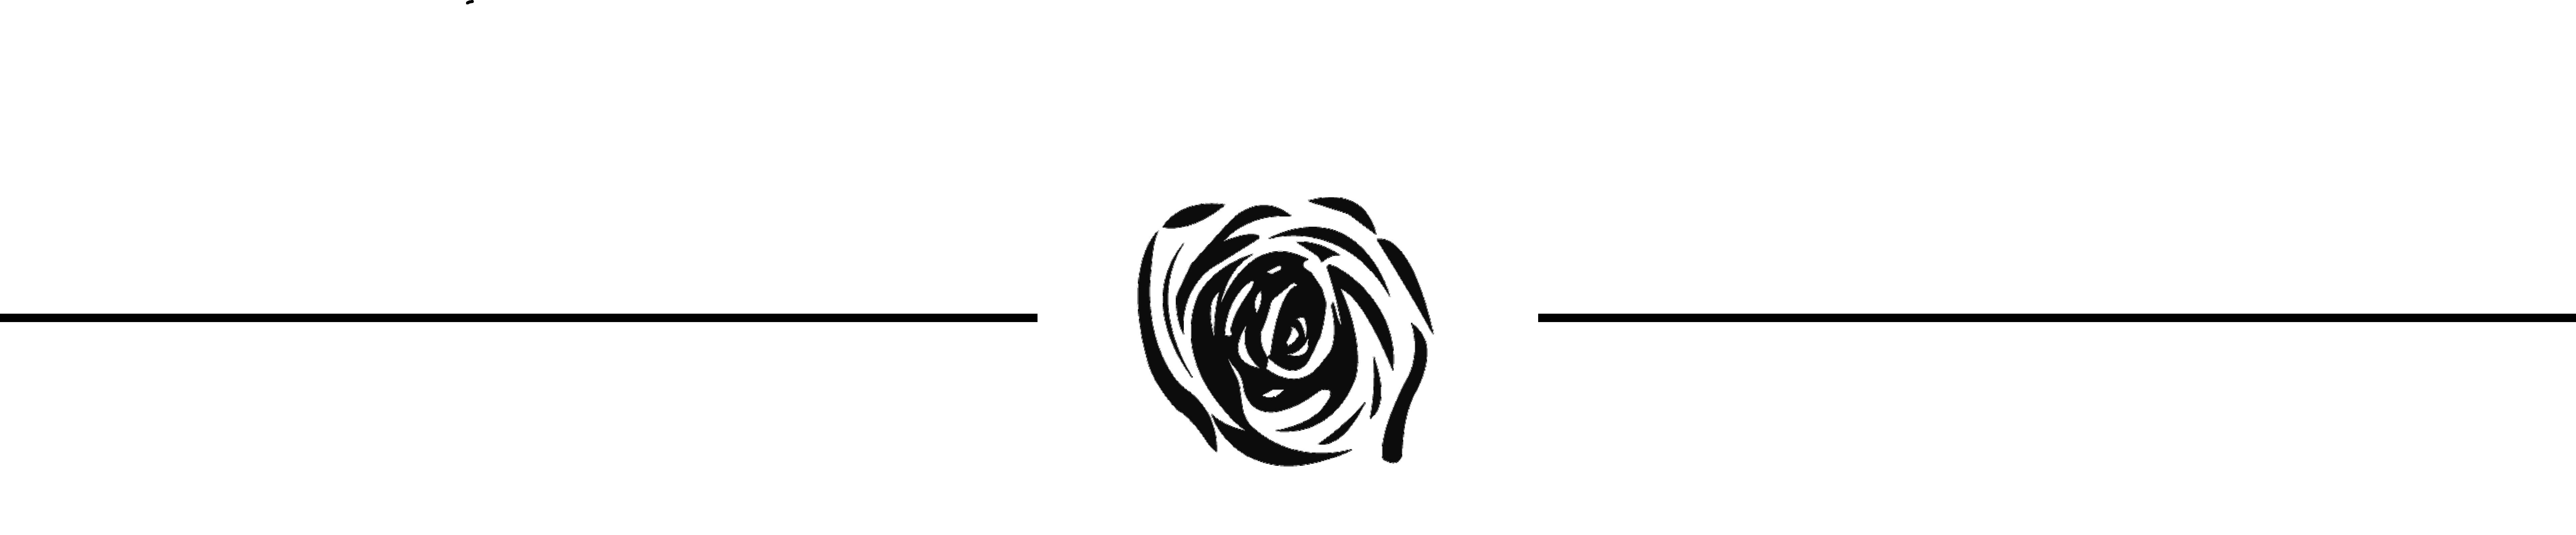 LOGO SEPARADOR G6